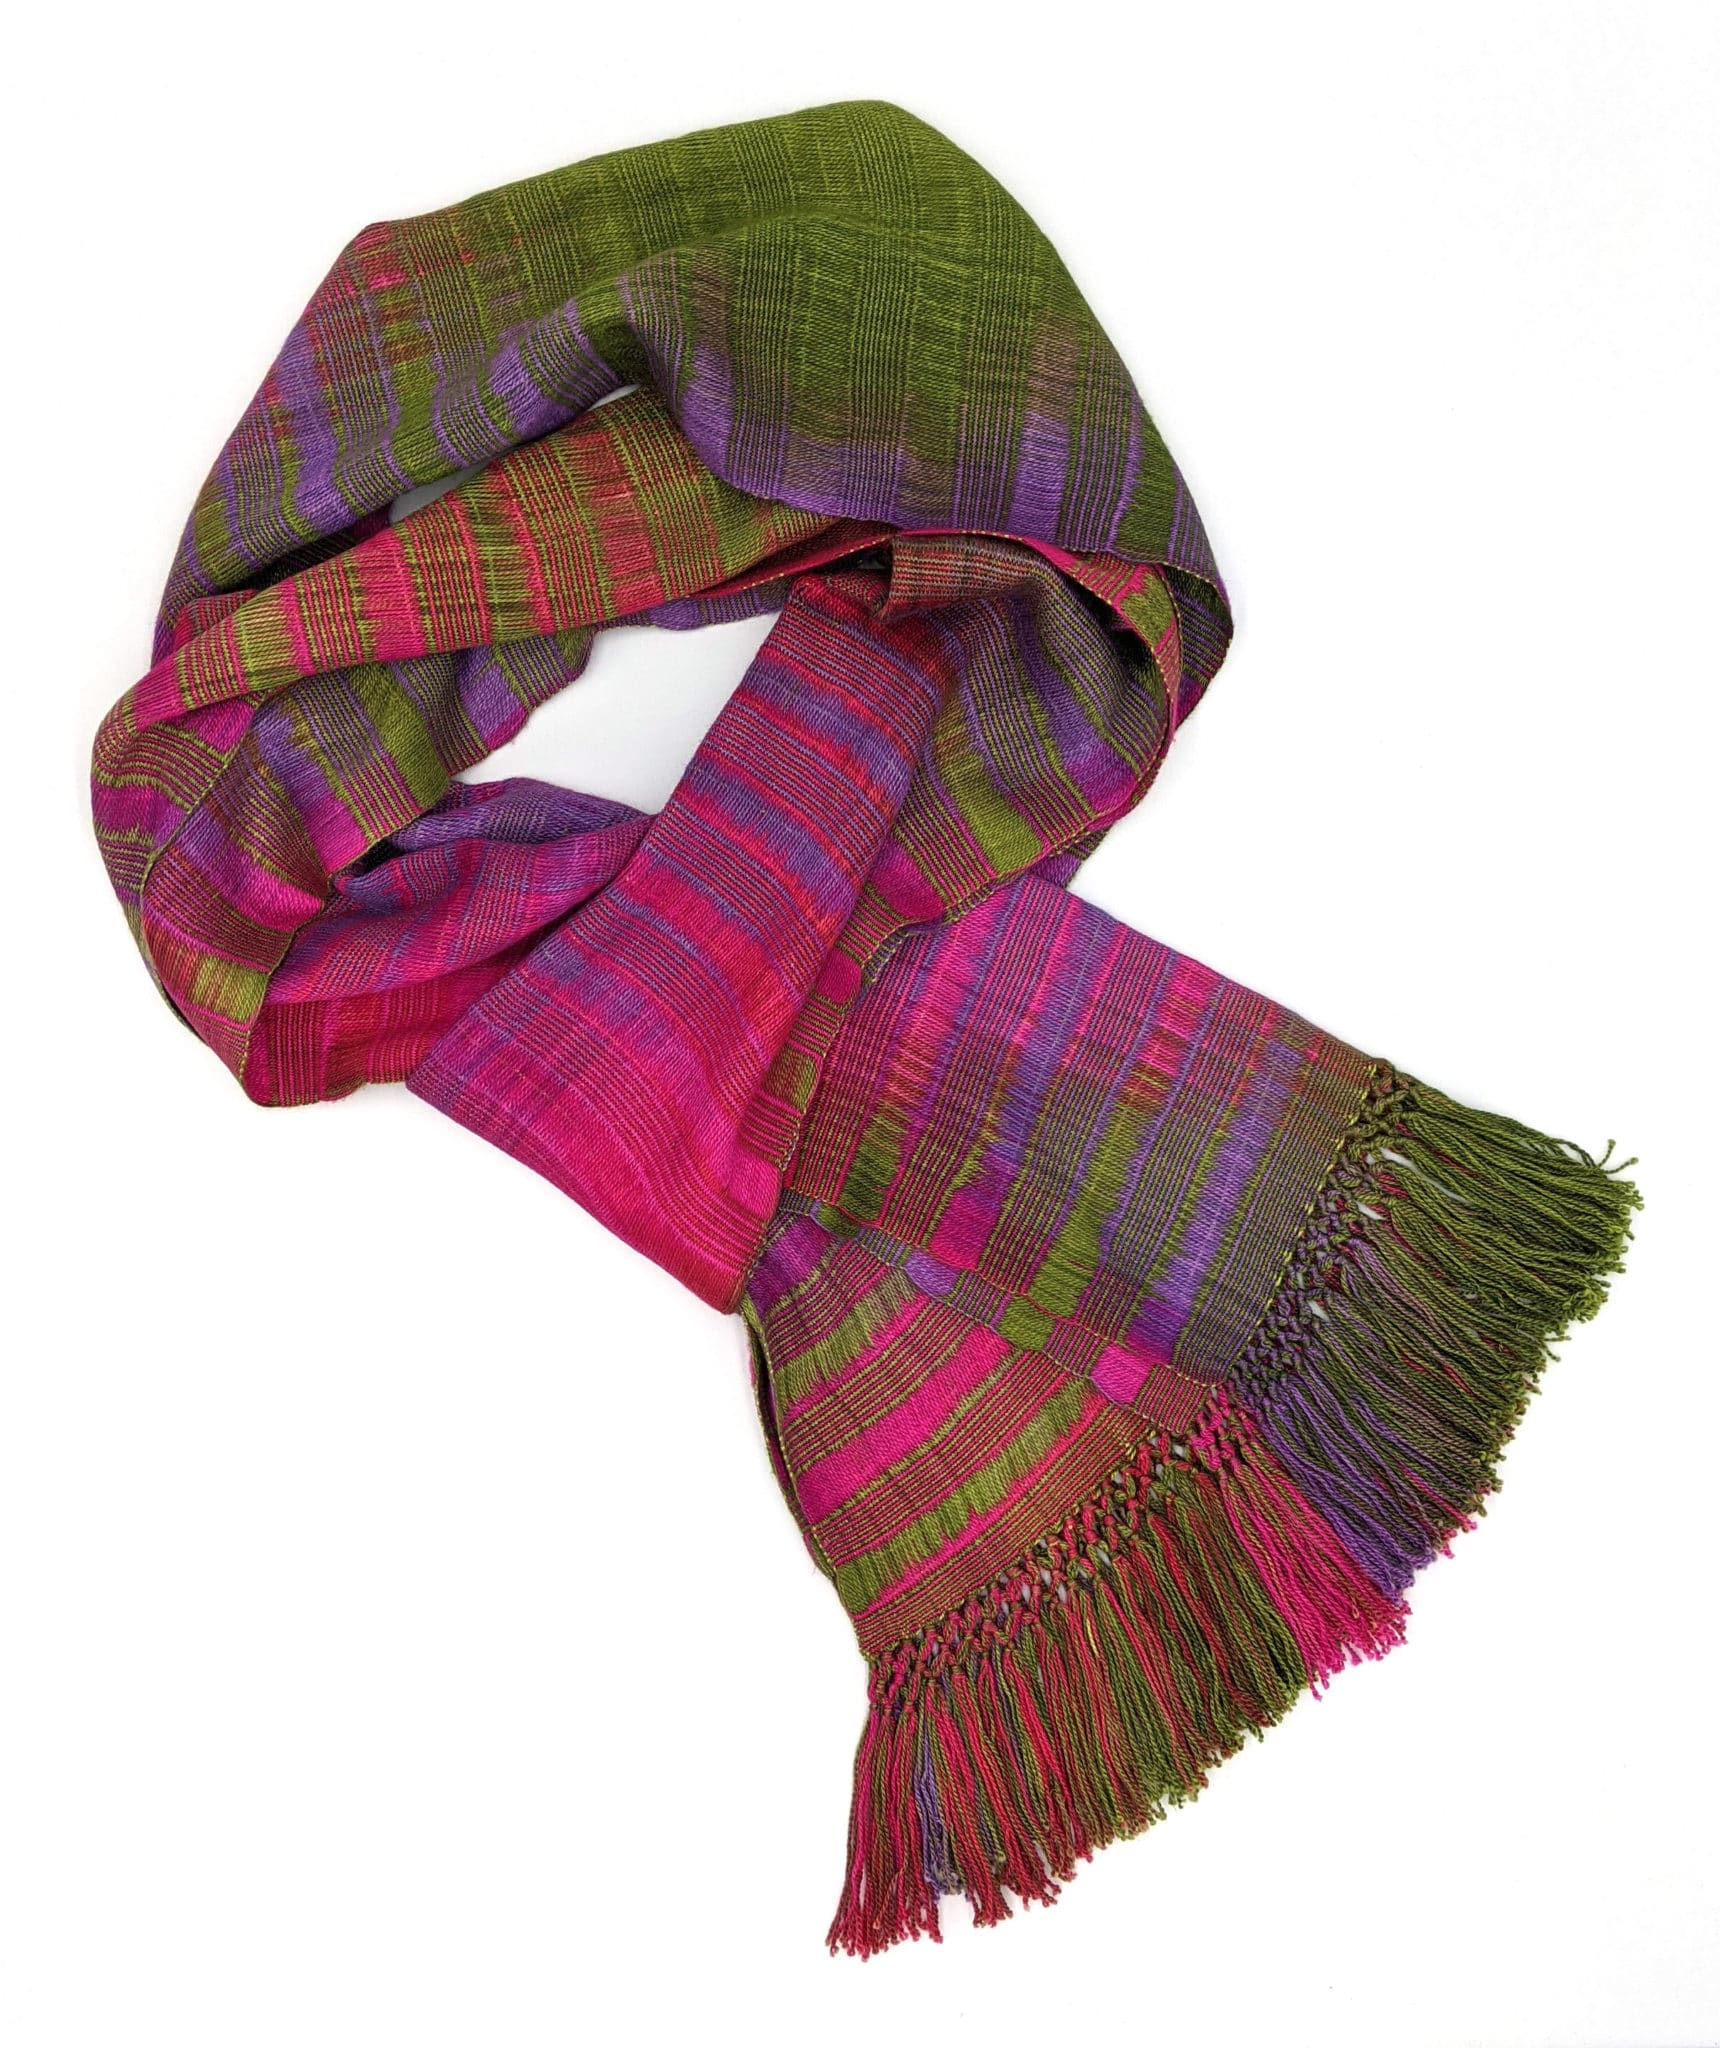 Fuchsia, Olive, Purple - Lightweight Bamboo Open-Weave Handwoven Scarf 8 x 68